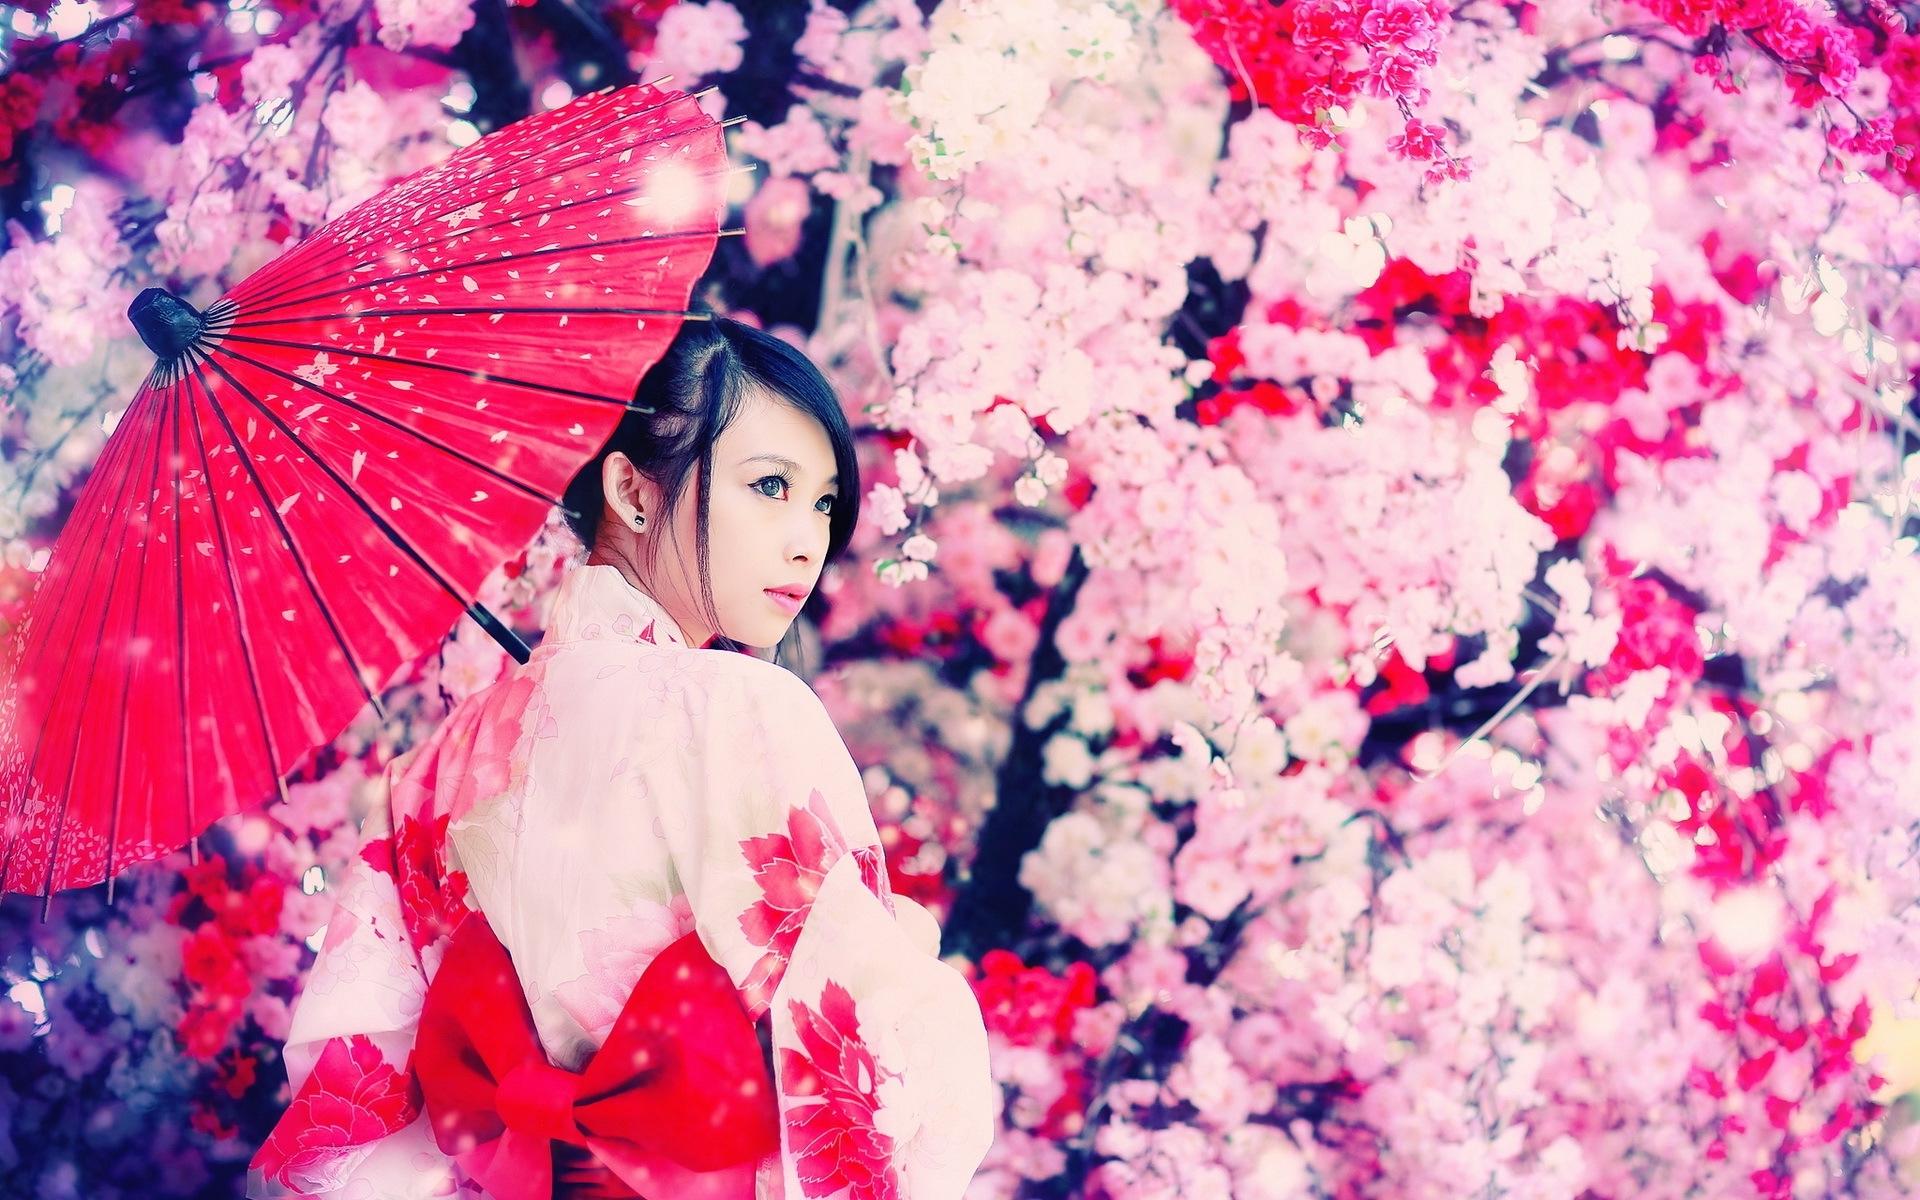 Geisha wallpaper   1347709 1920x1200